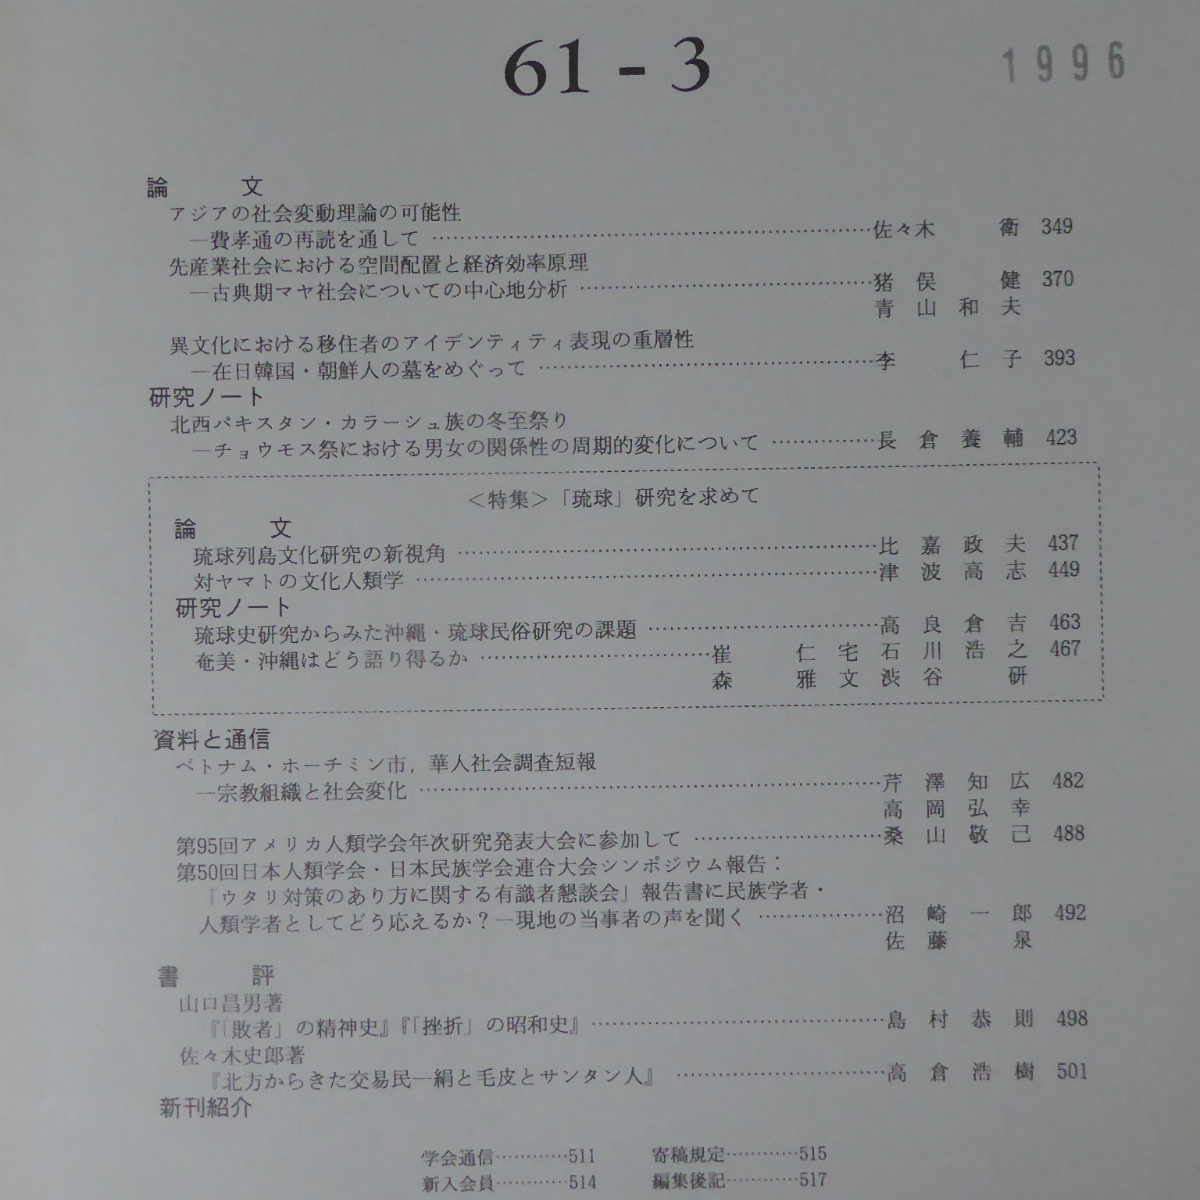 a11/ 民族學研究【「琉球」研究を求めて】在日韓国・朝鮮人の墓をめぐって/北西パキスタン・カラーシュ族の冬至祭り_画像3